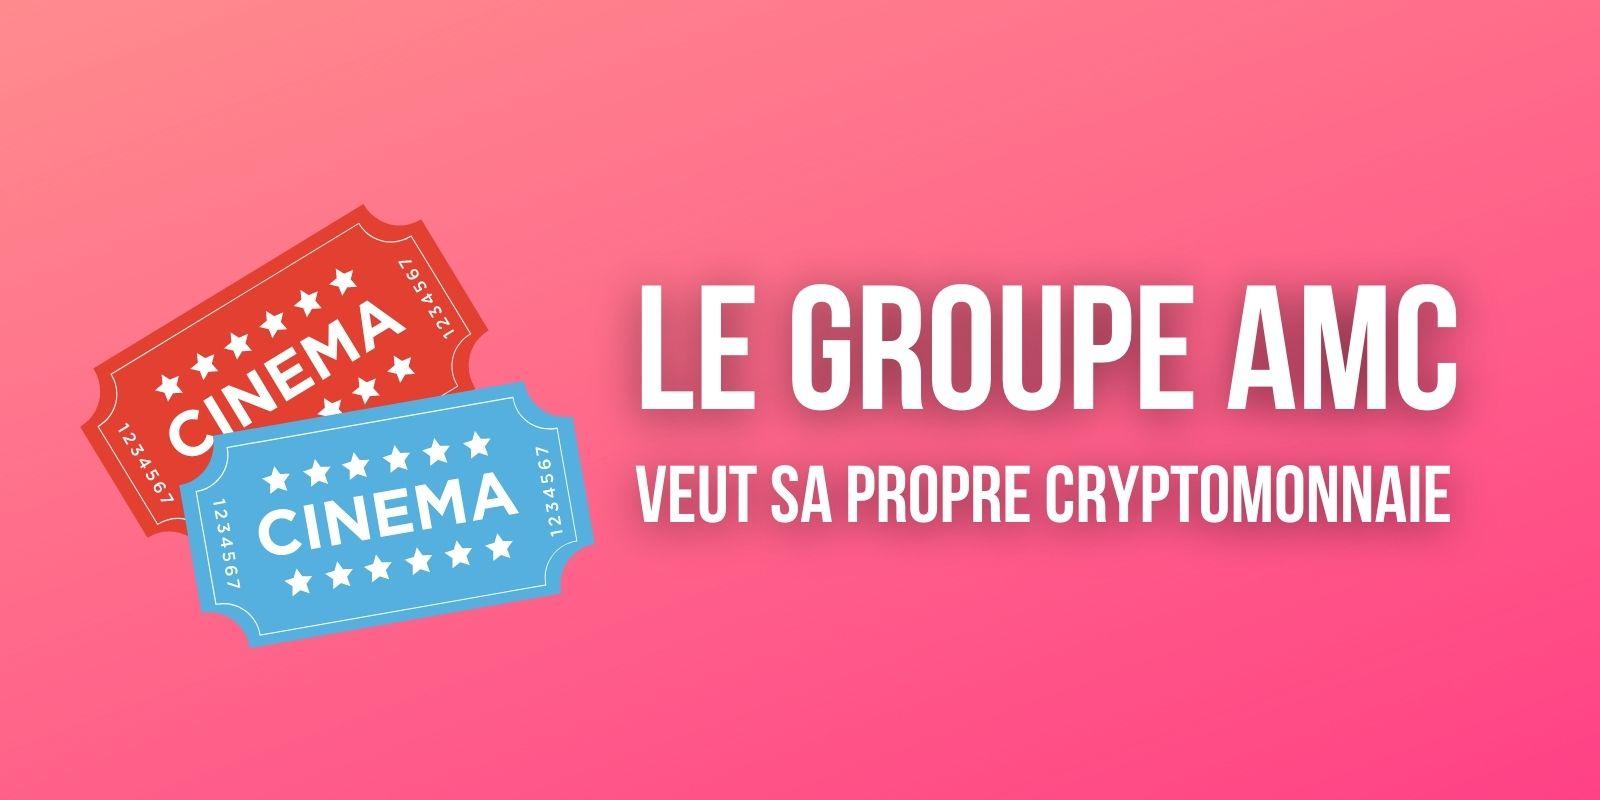 La chaîne de cinémas AMC envisage de lancer sa propre cryptomonnaie